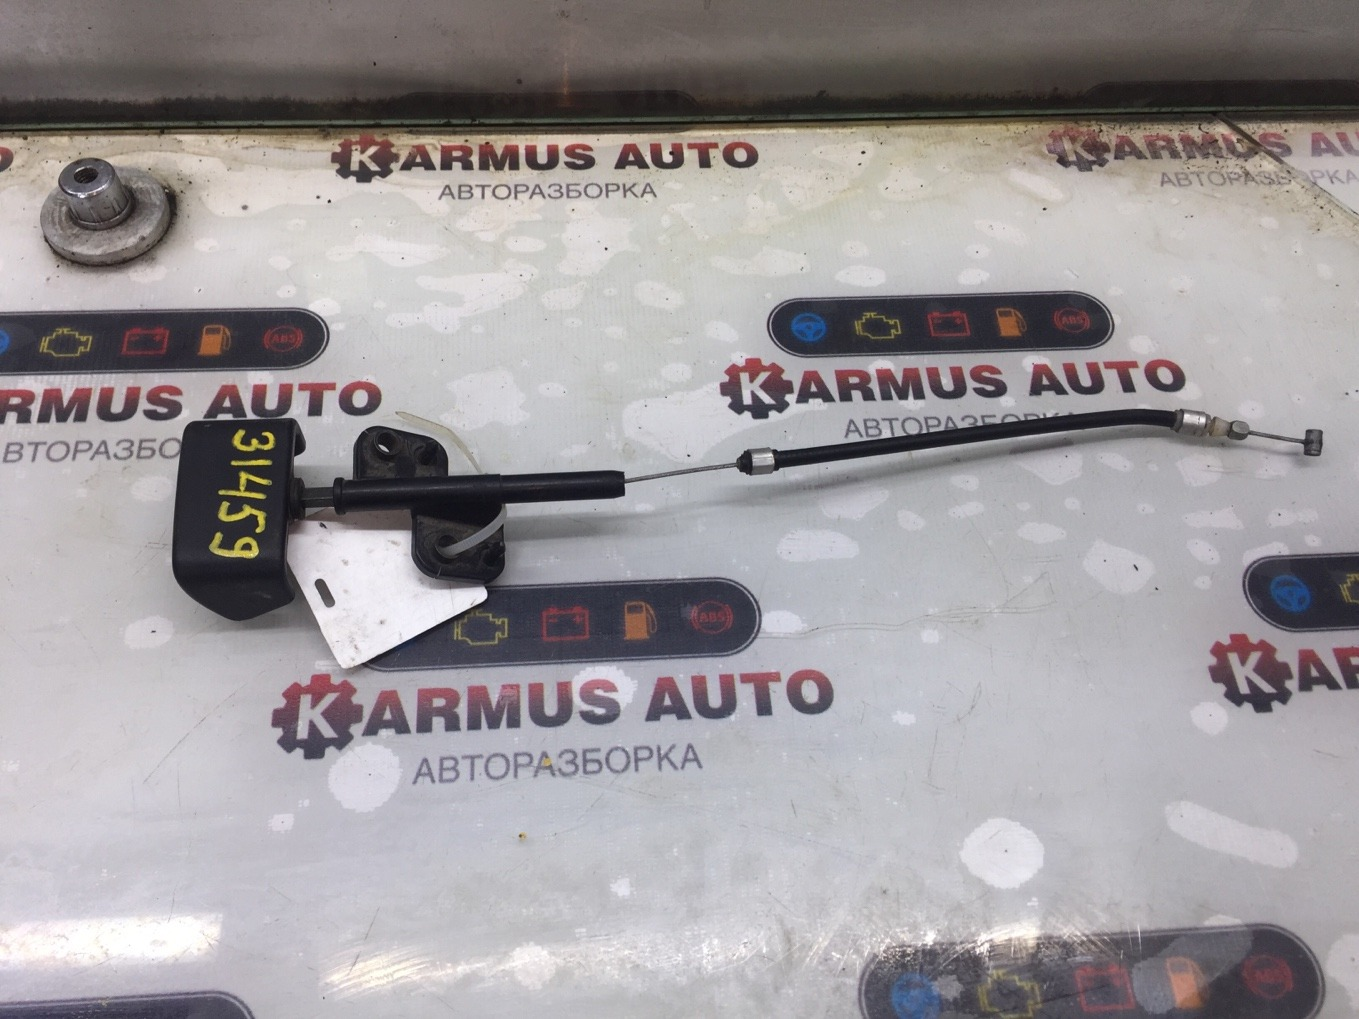 Ручка сброса стояночного тормоза Toyota Aristo JZS160 2JZGE